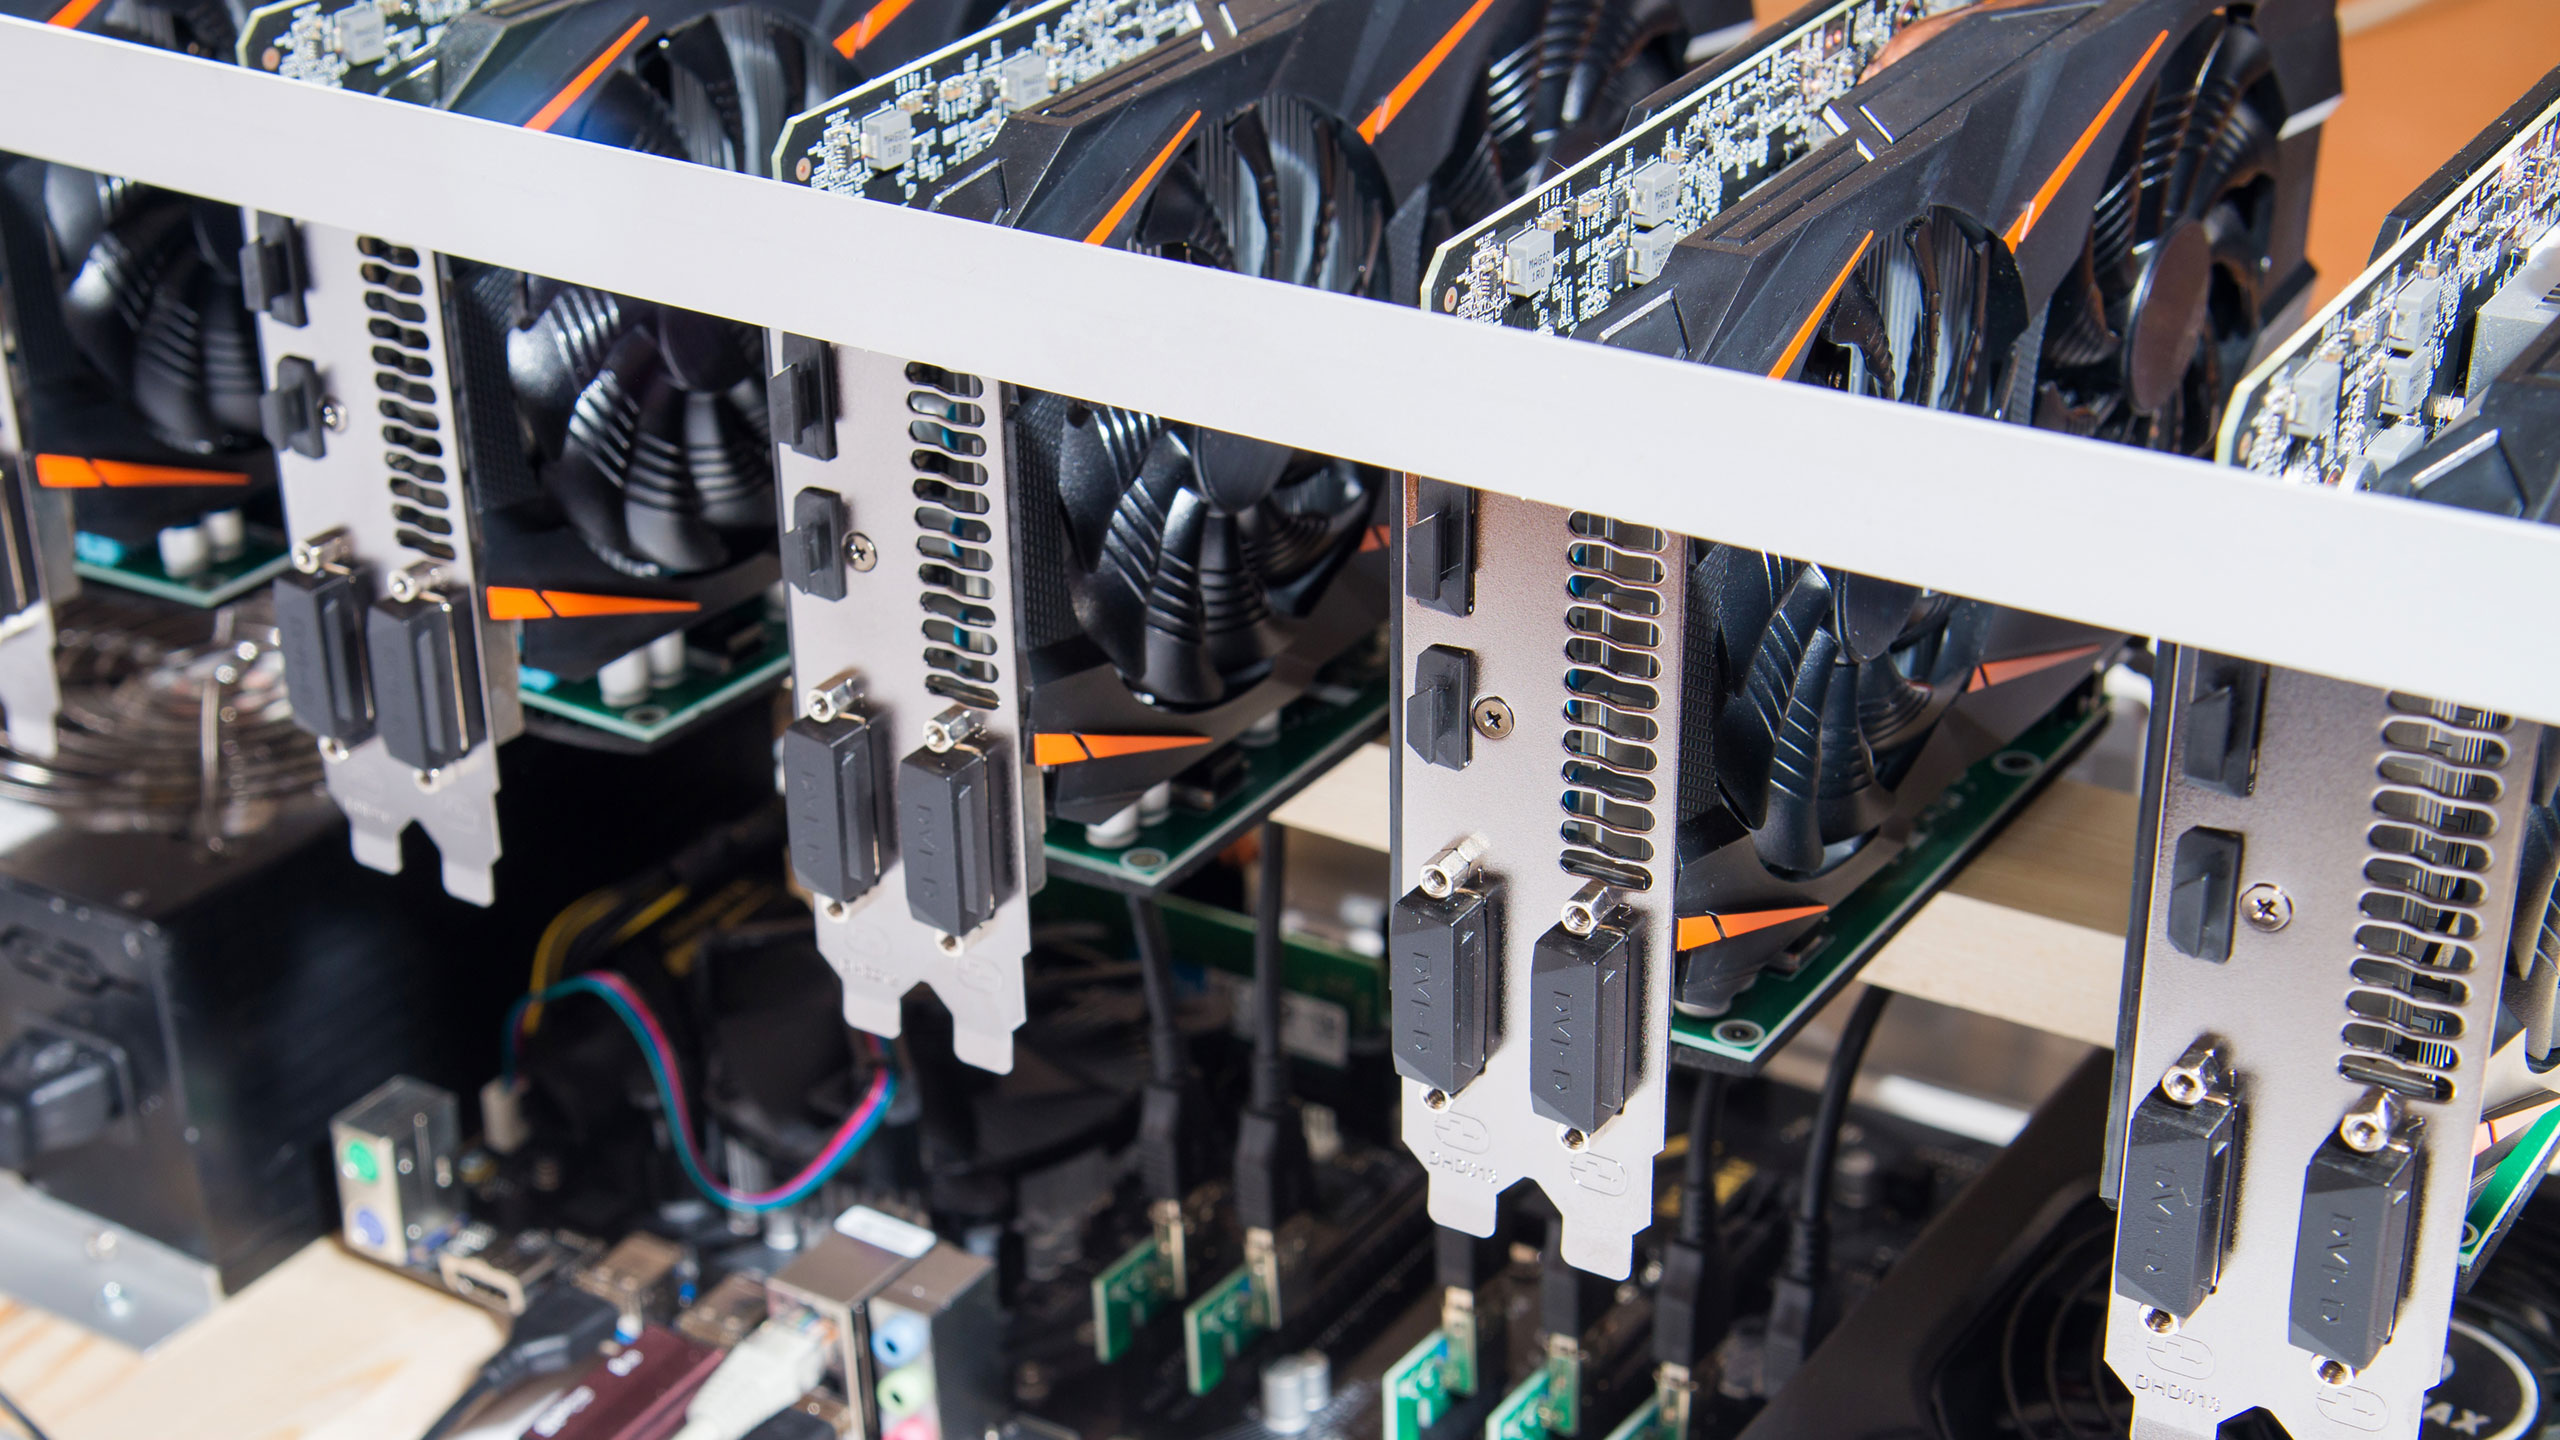 miglior bitcoin mining rig